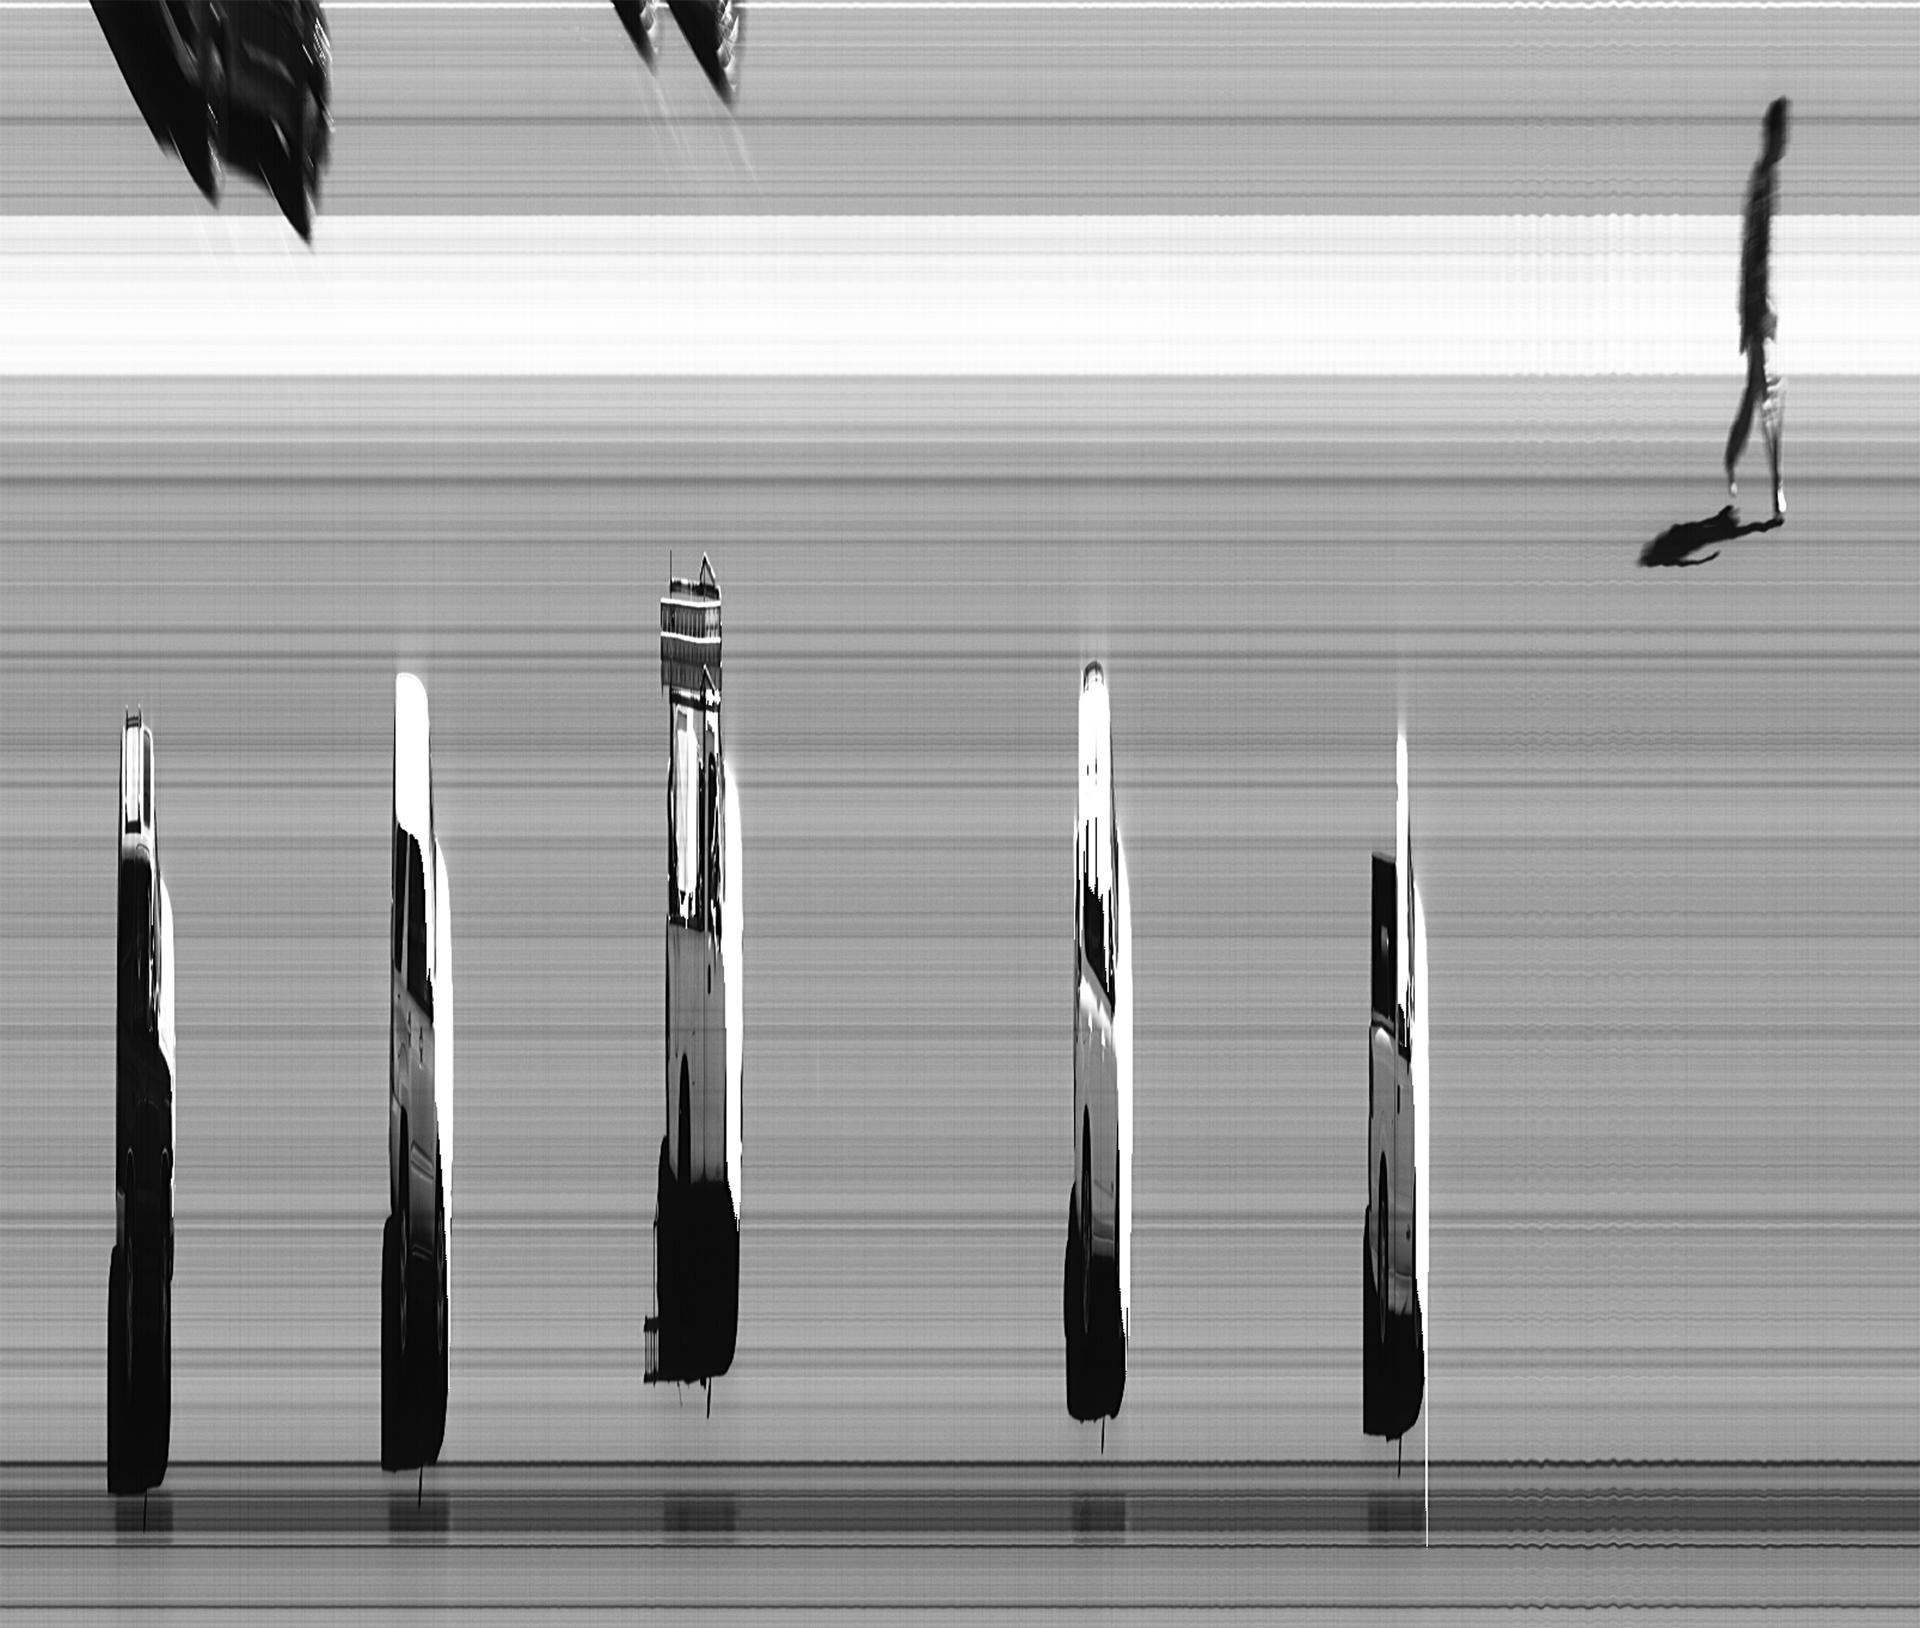 """Waimano Home Road"" 2014. Digital Photograph. 17x22"""